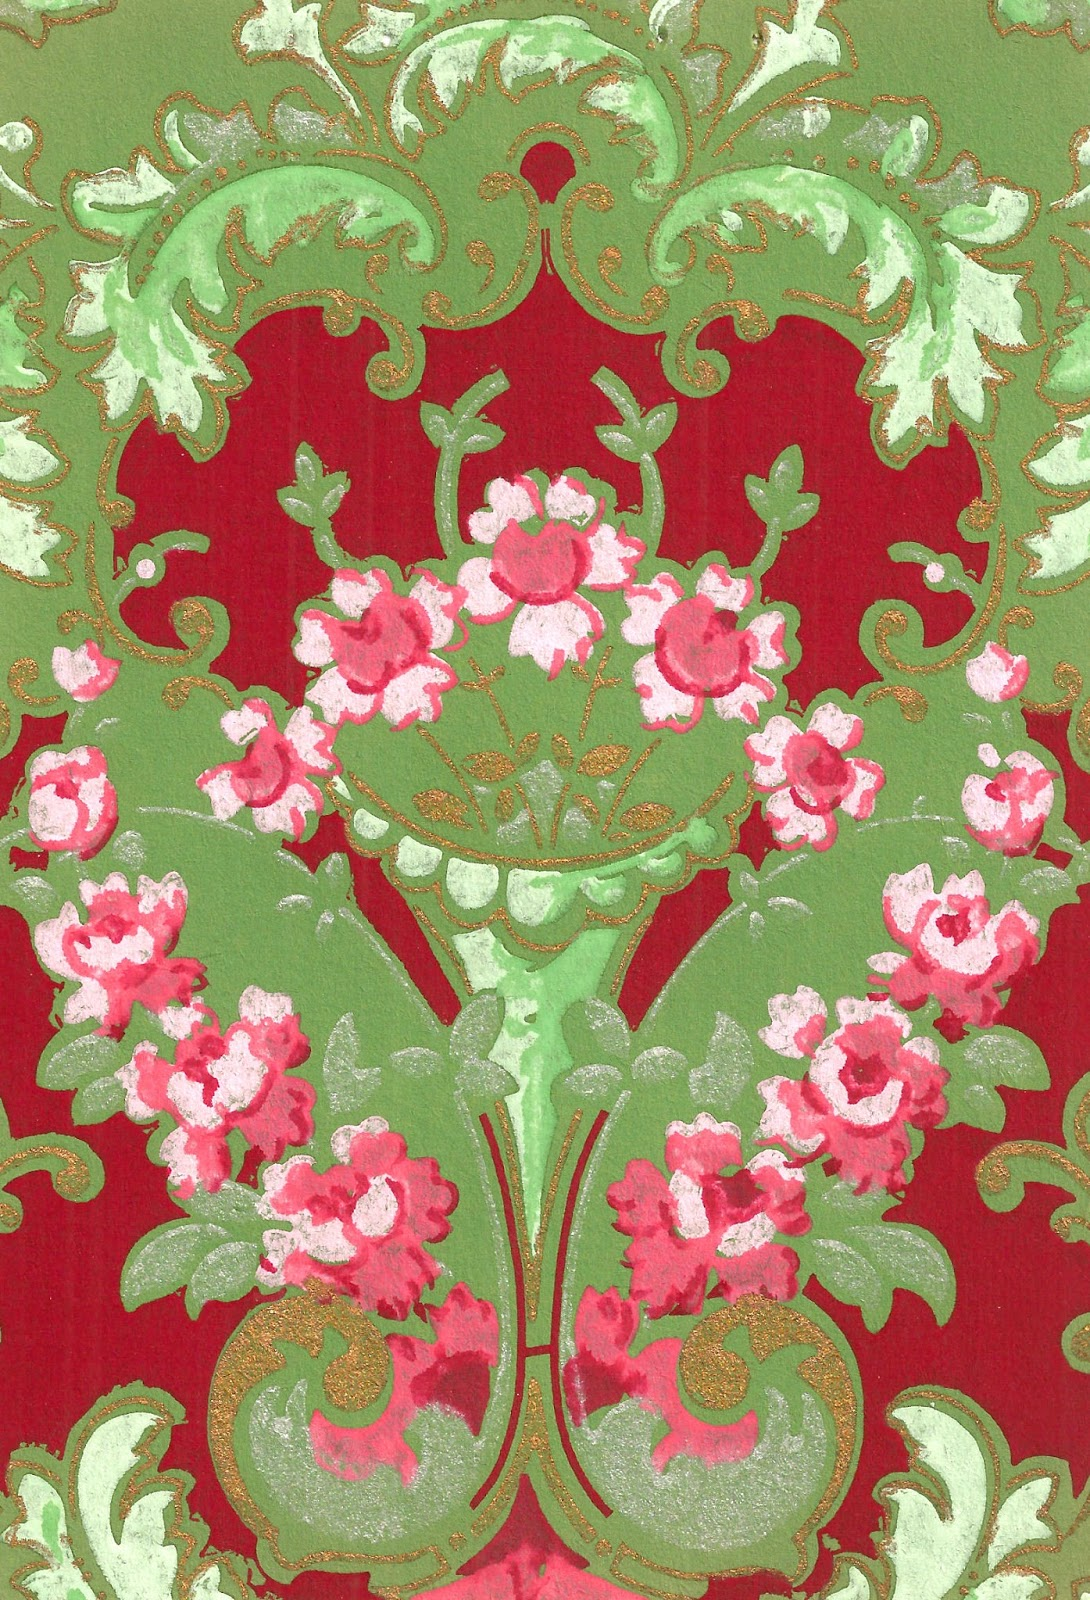 Antique Images Antique Victorian Wallpaper Papercraft Scrapbook Red